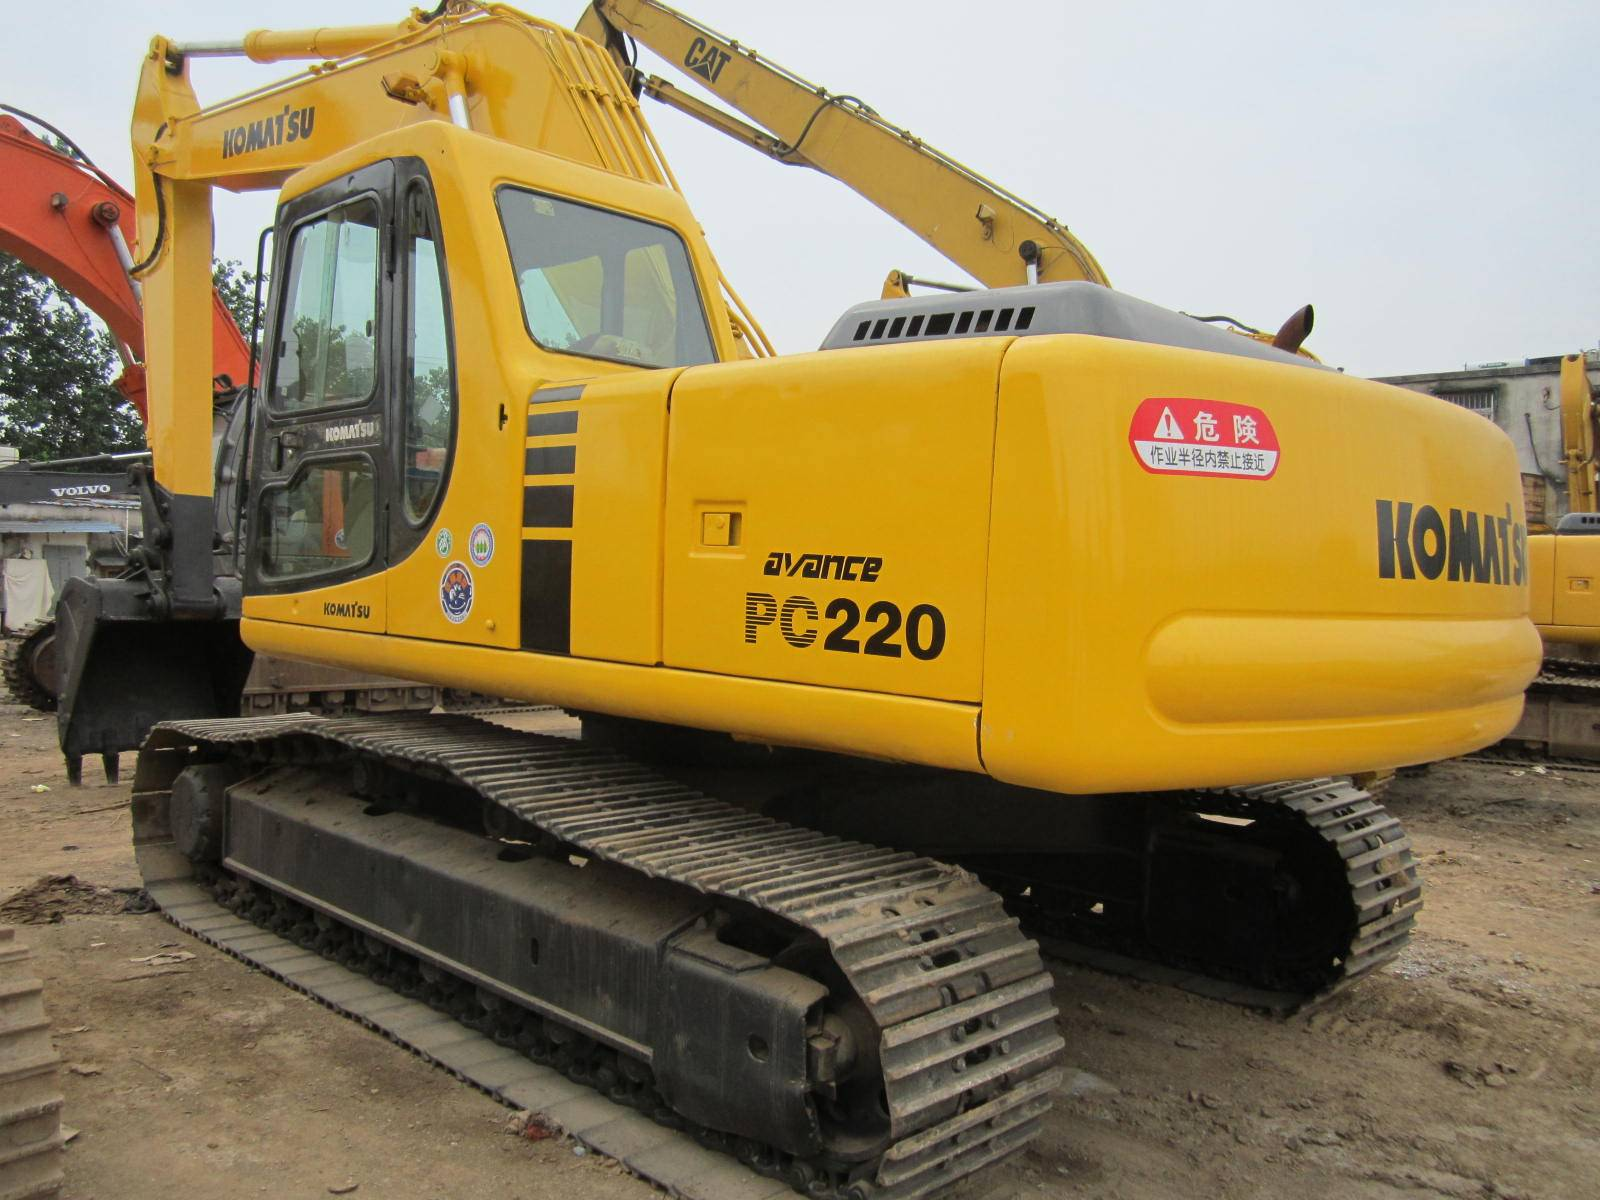 Used komatsu pc220-6 excavator for sale